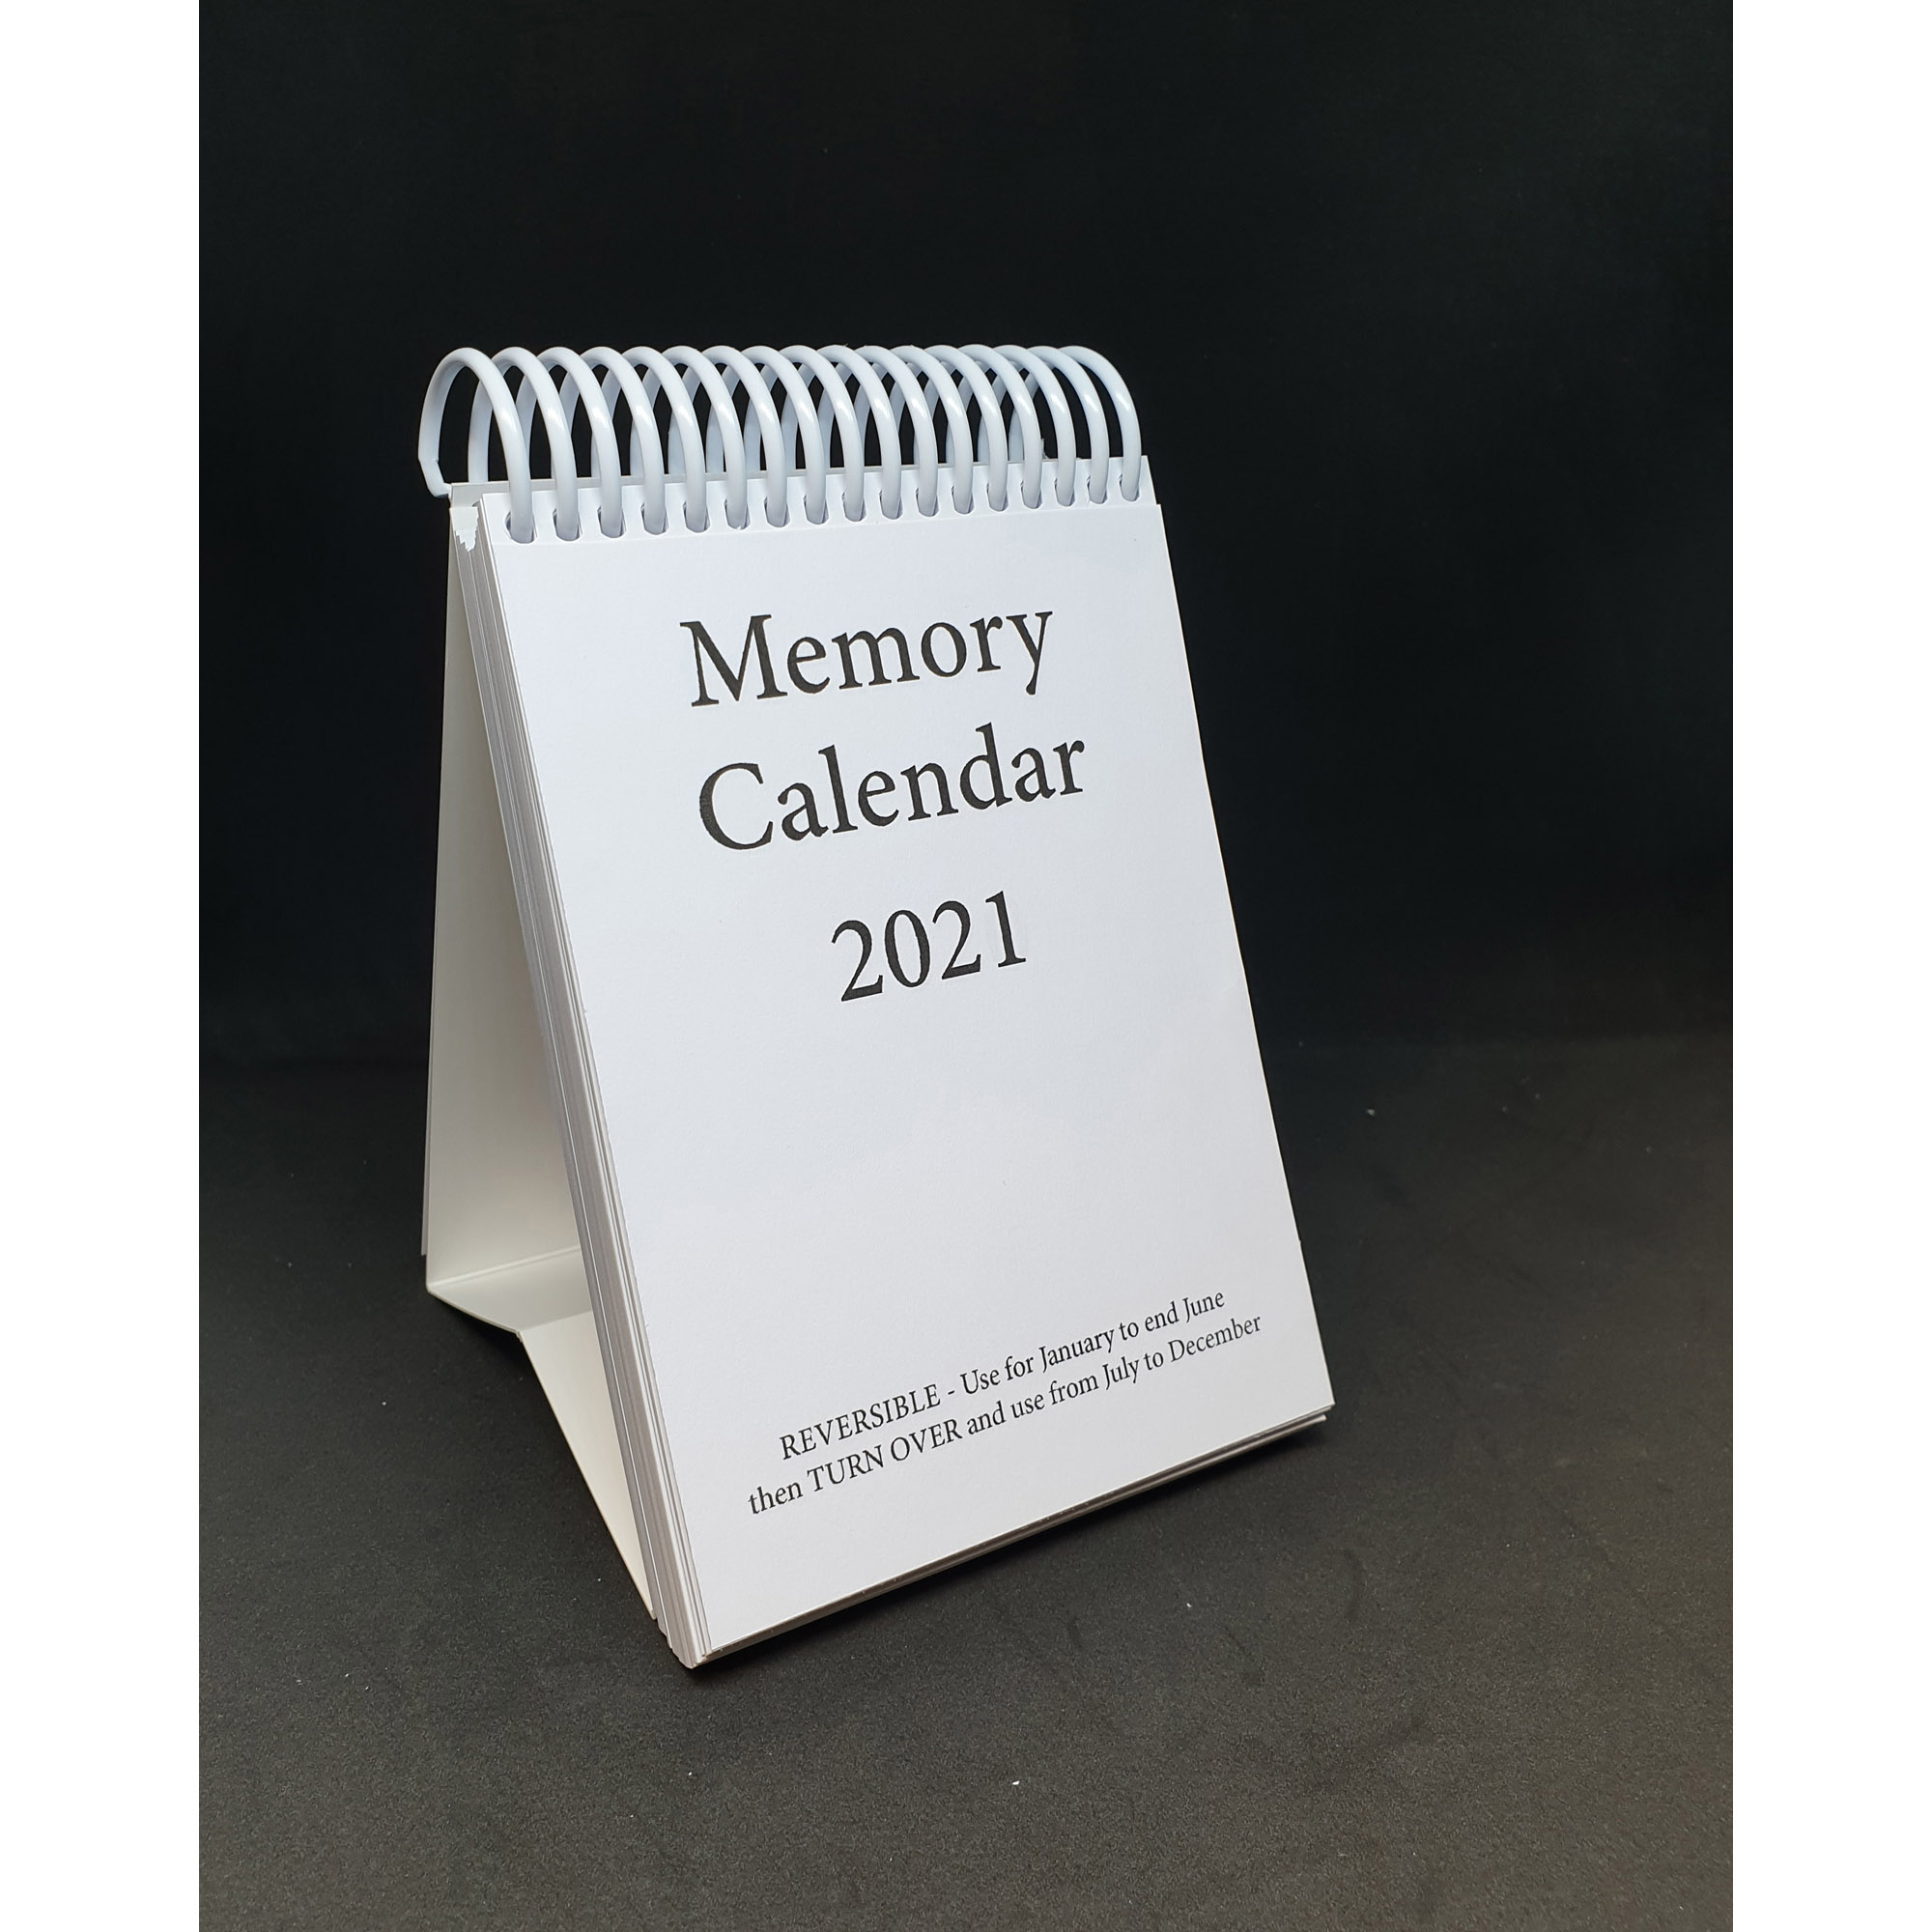 2021 Memory calendar - standing